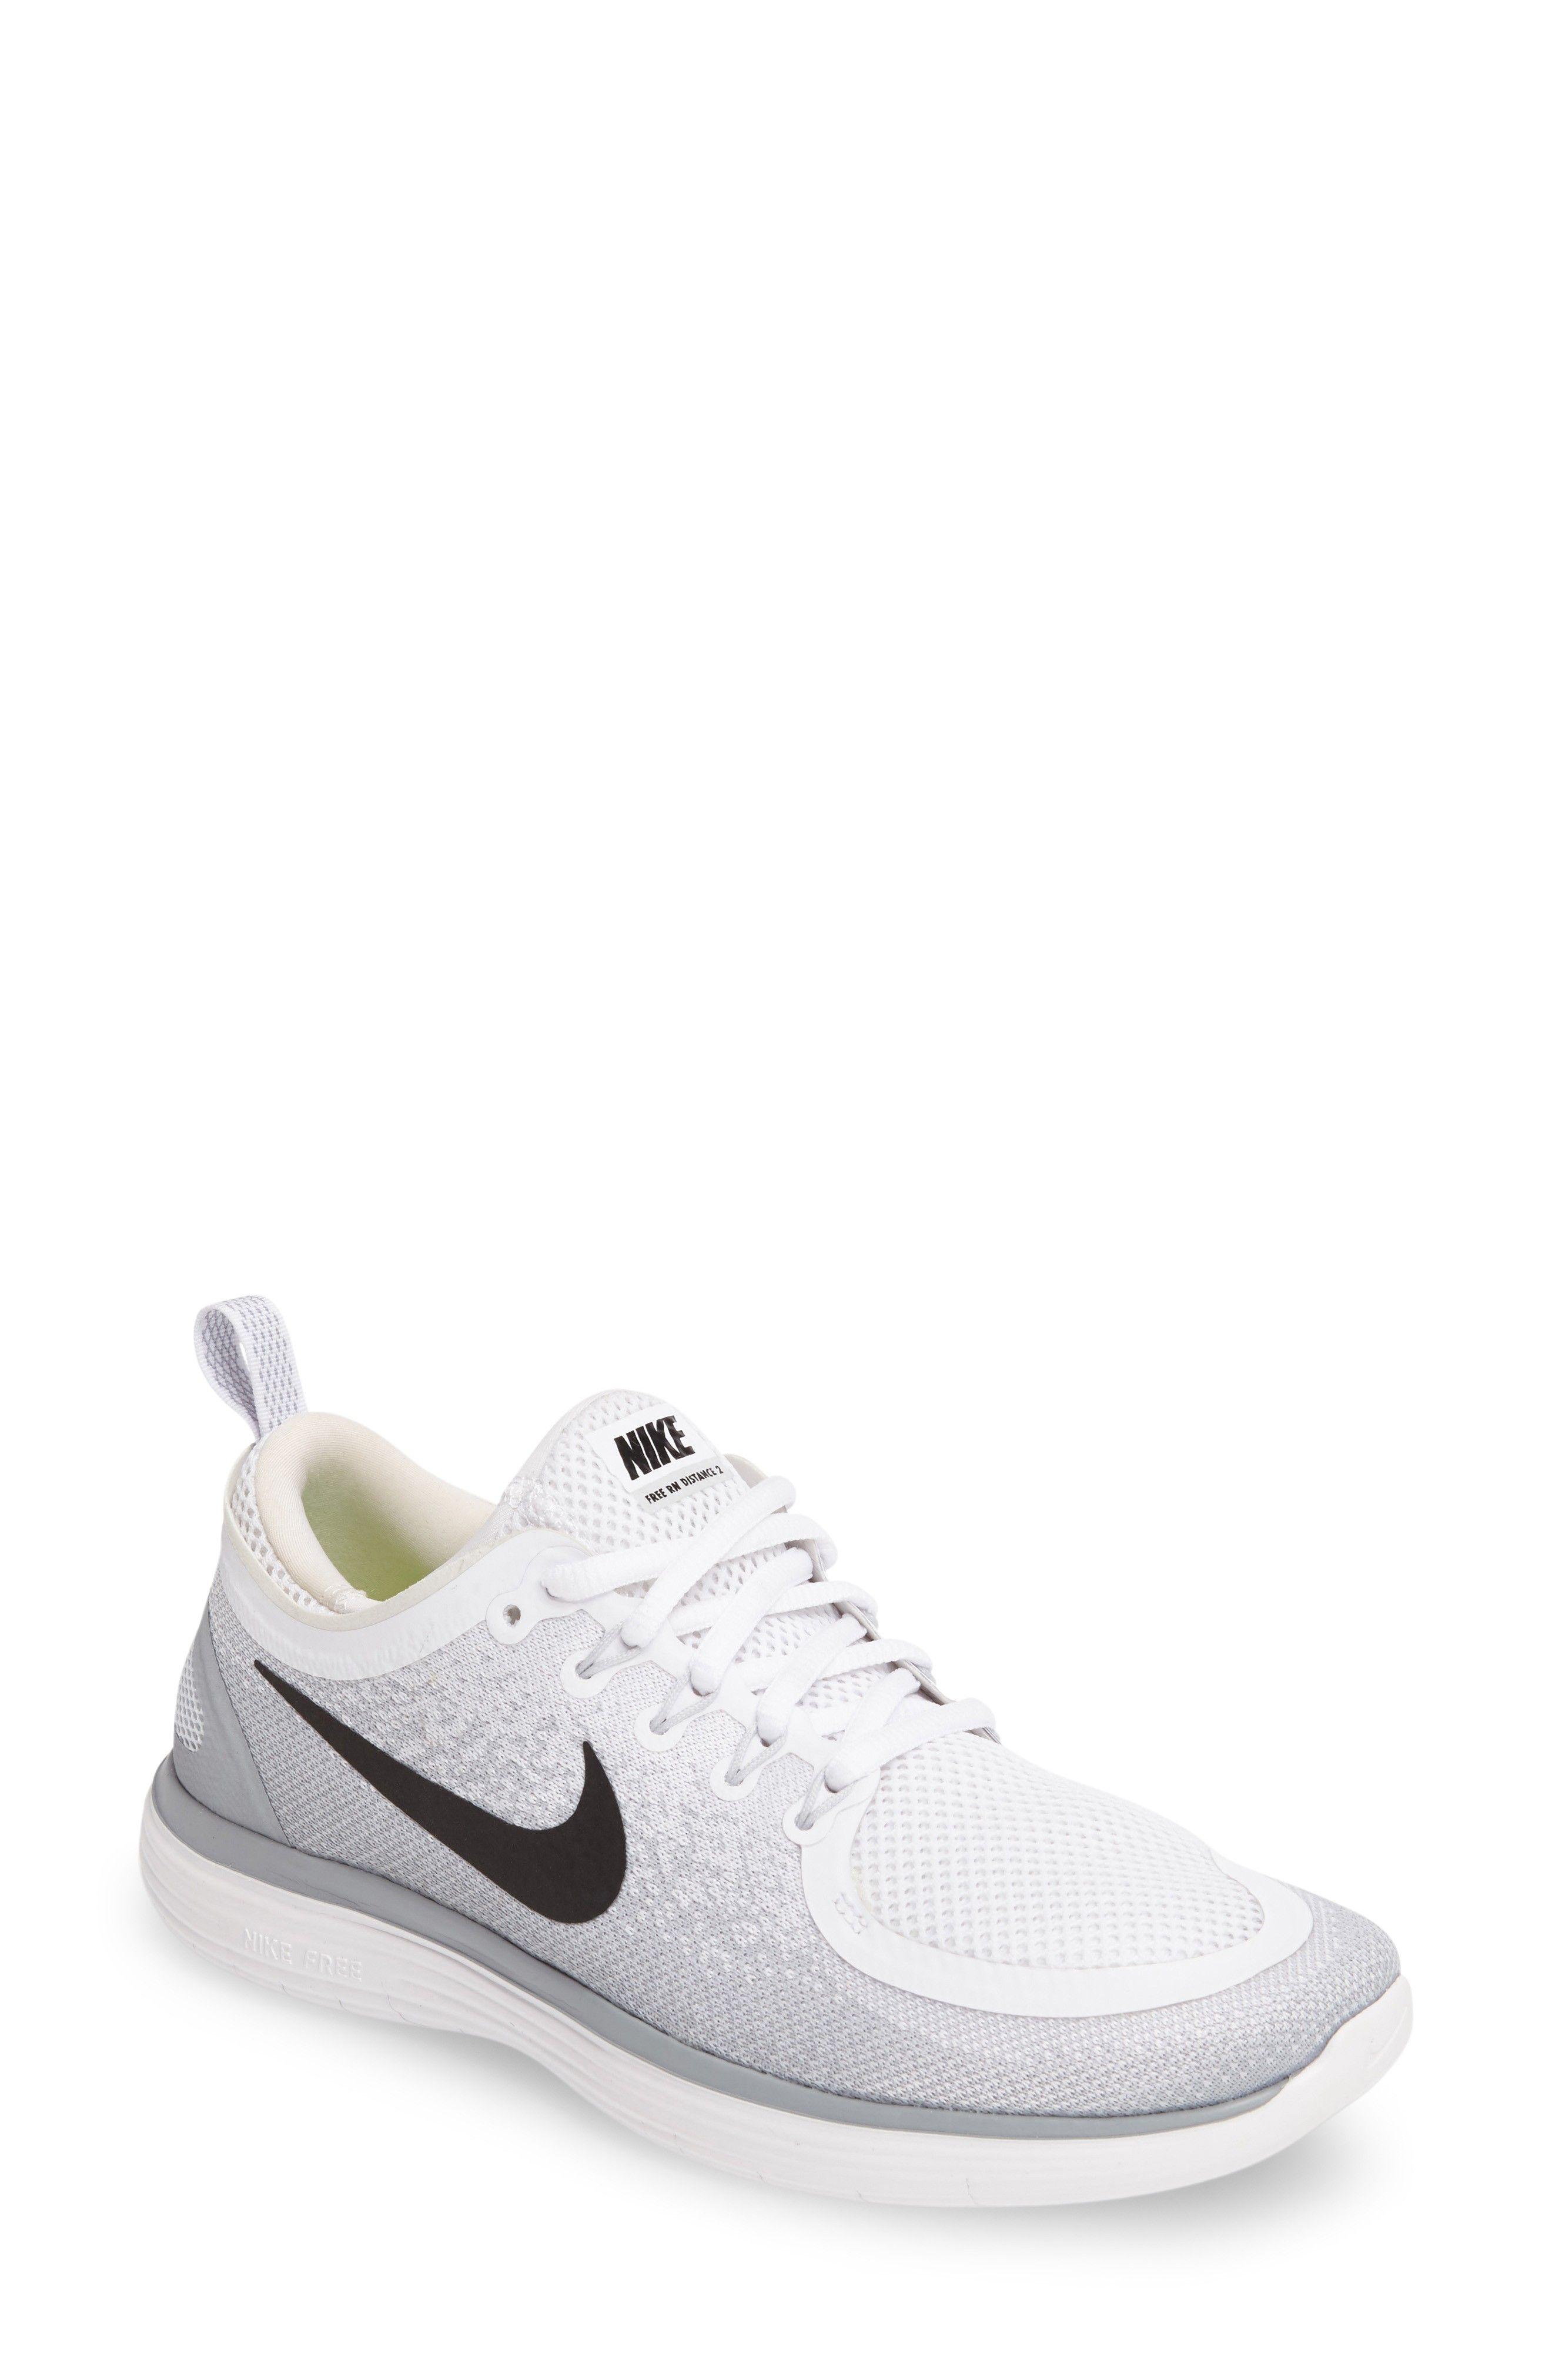 Free Run Distance 2 Running Shoe   Nike workout shoes